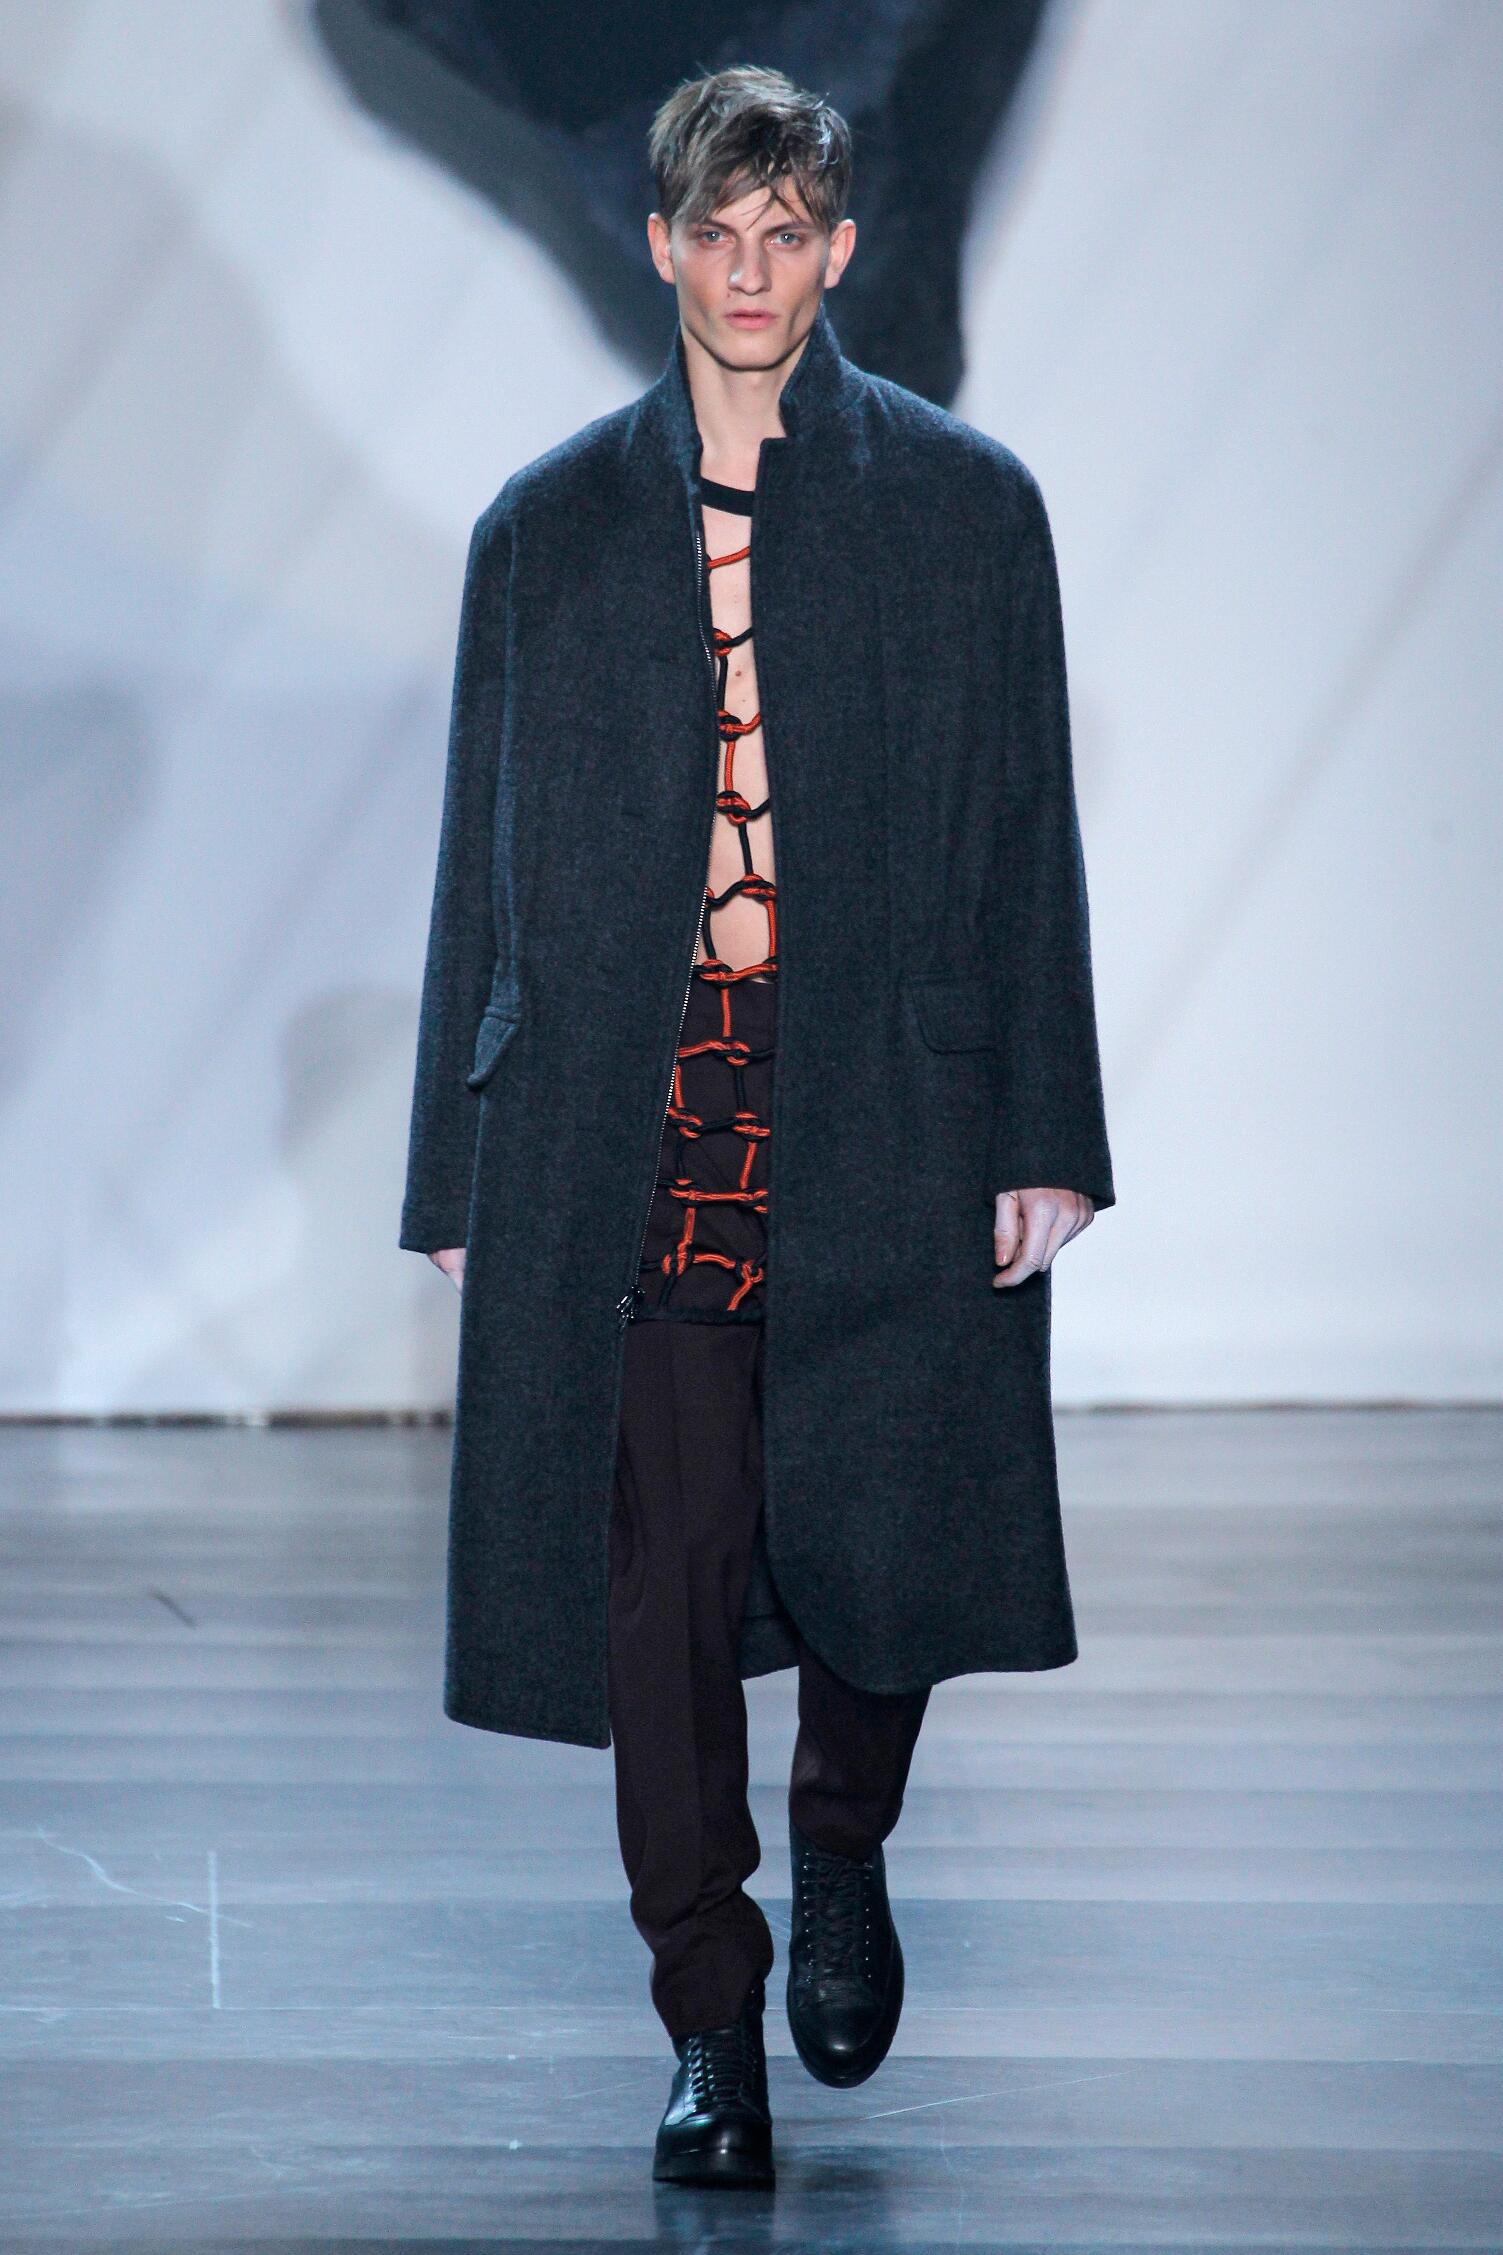 Winter Fashion Trends 2015 2016 3.1 Phillip Lim Collection